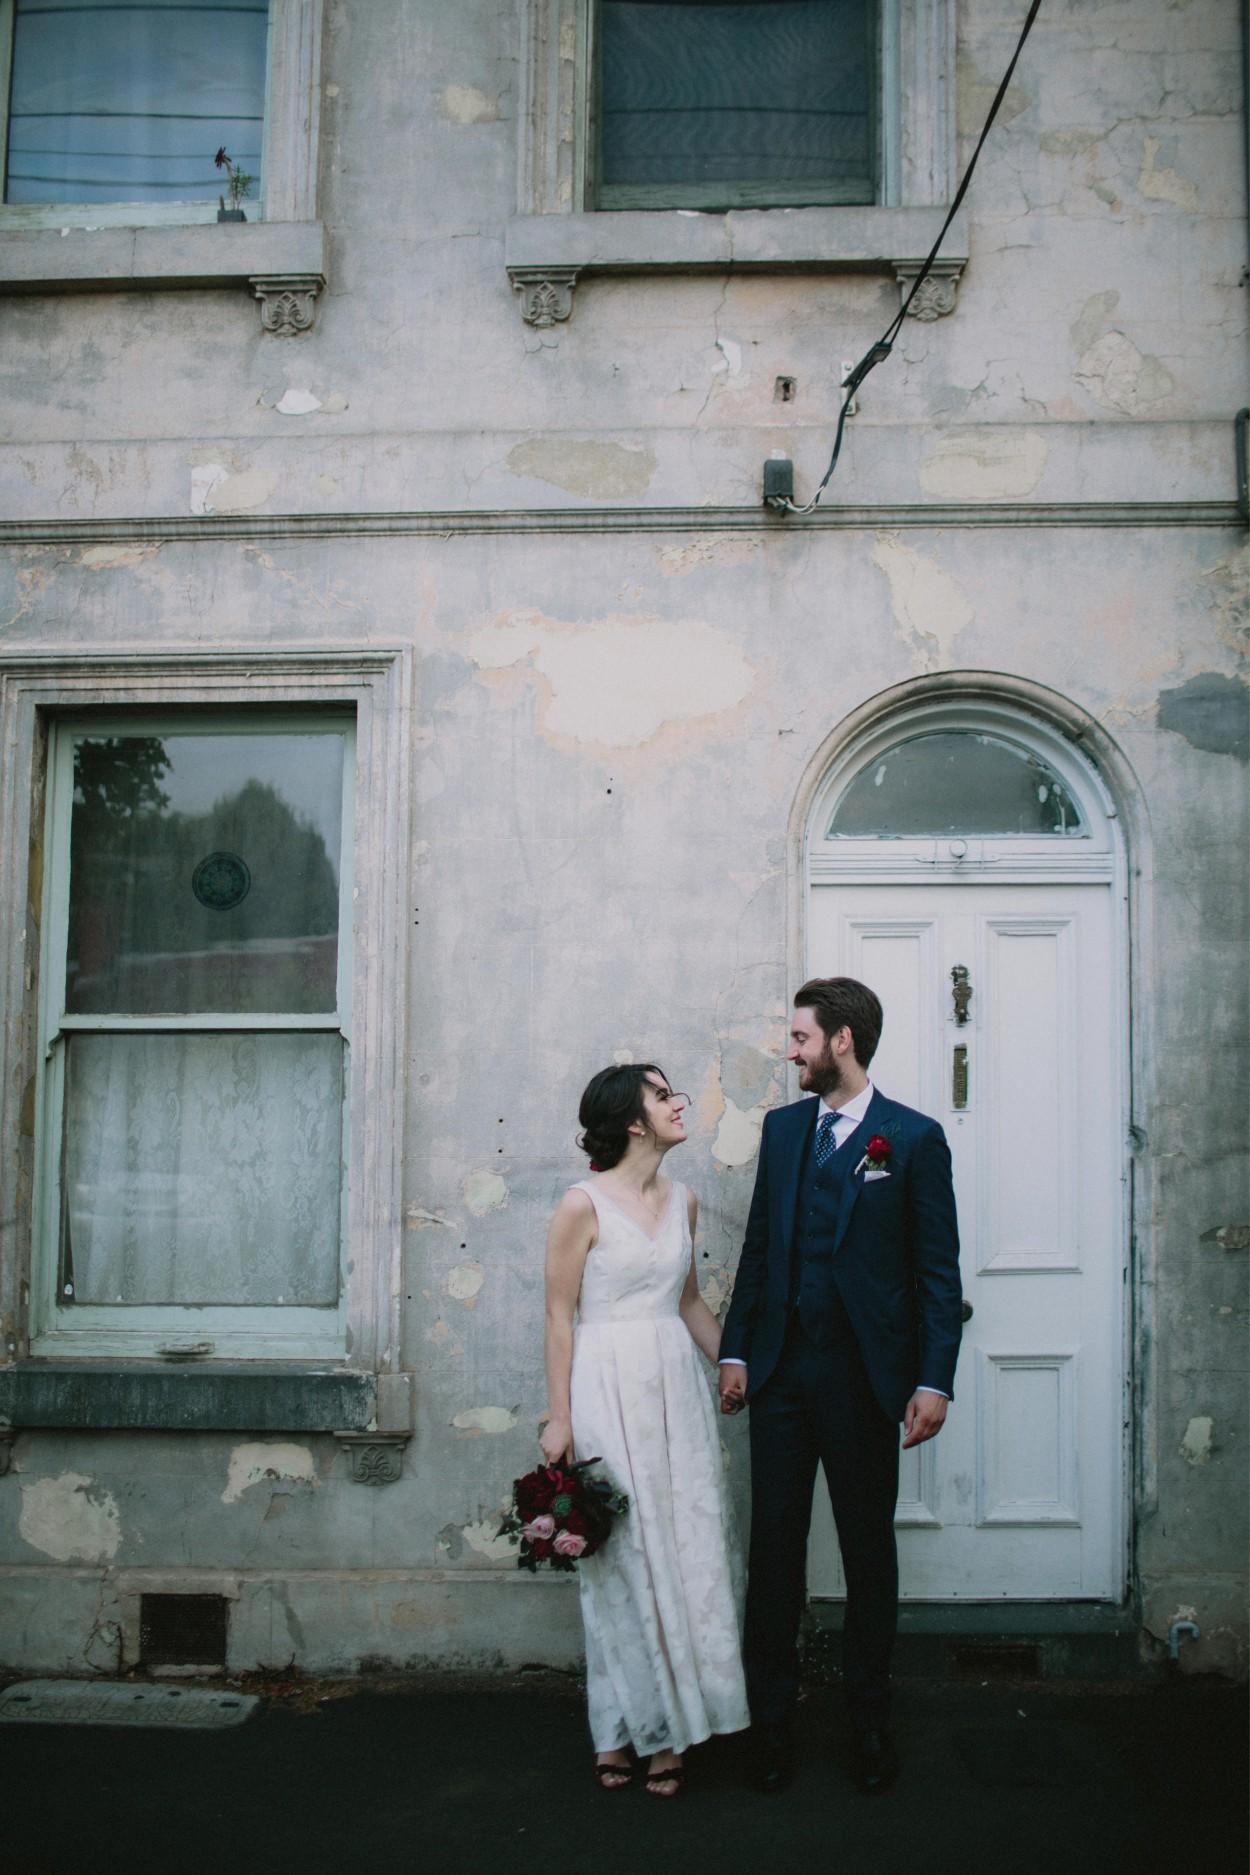 I-Got-You-Babe-Weddings-Fitzroy-Town-Hall-Lauren-Hugo140.jpg